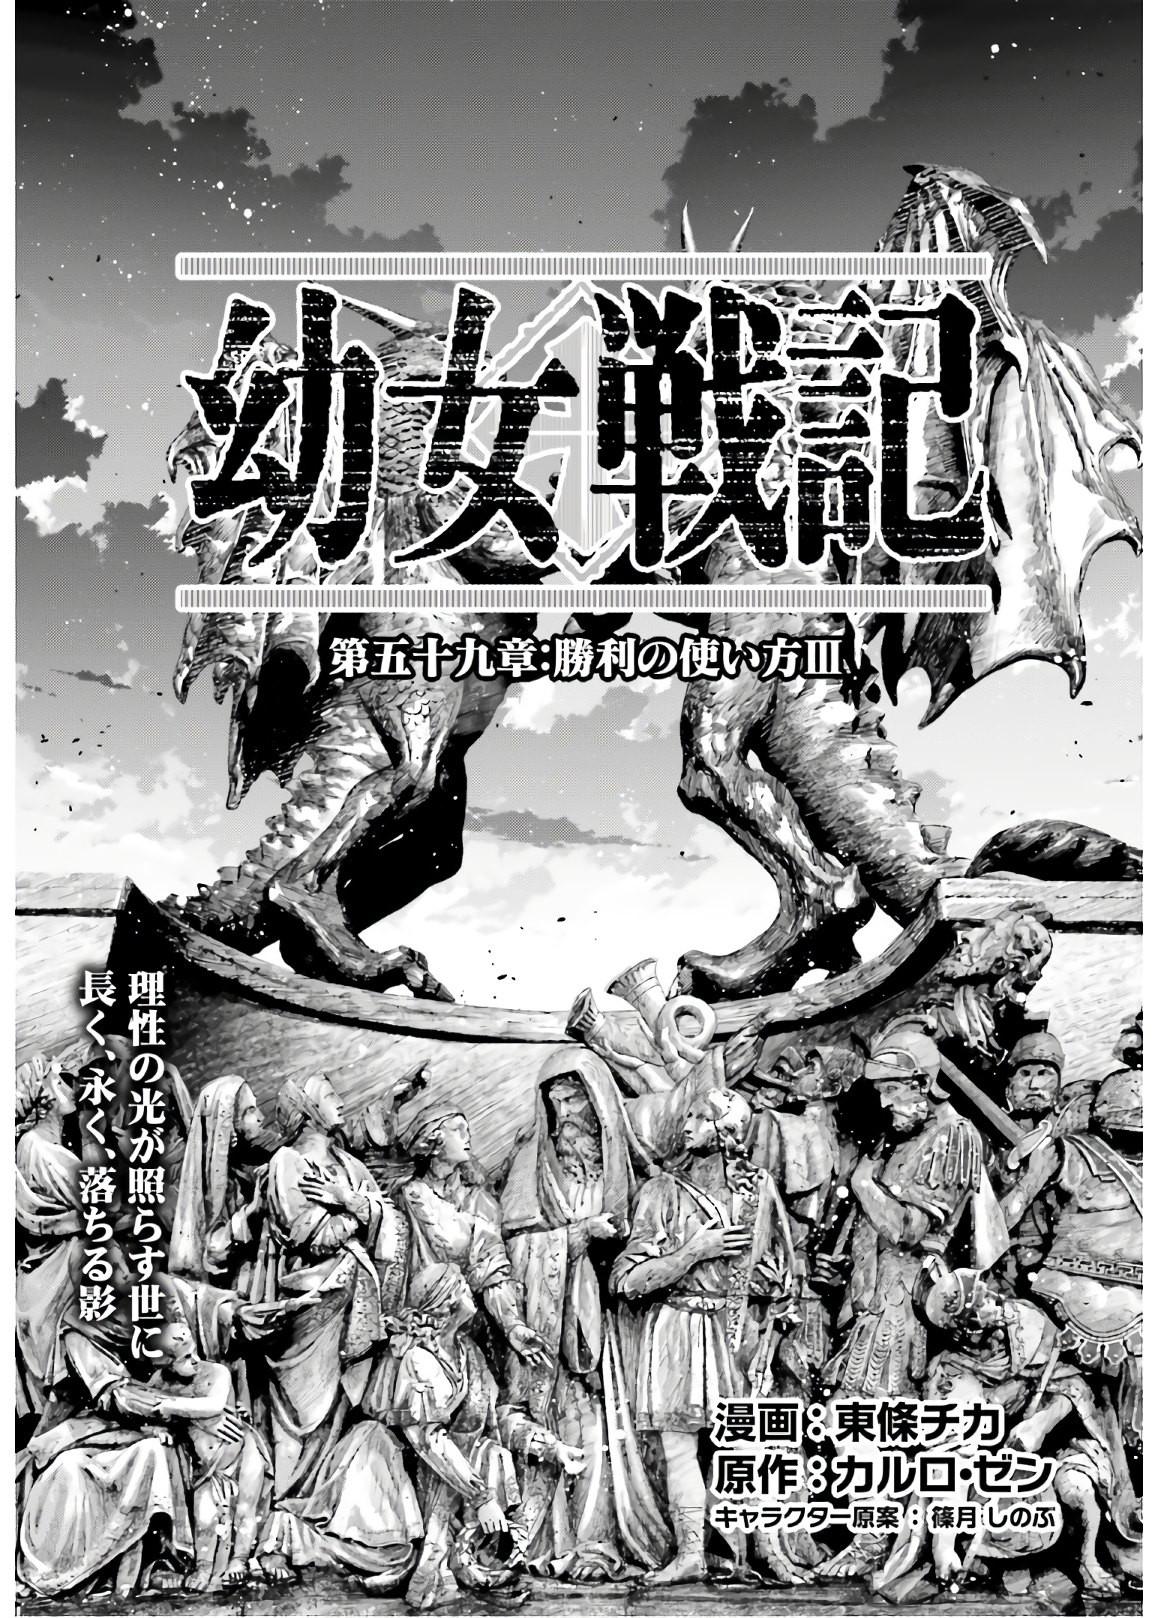 Youjo Senki - Chapter 59 - Page 1